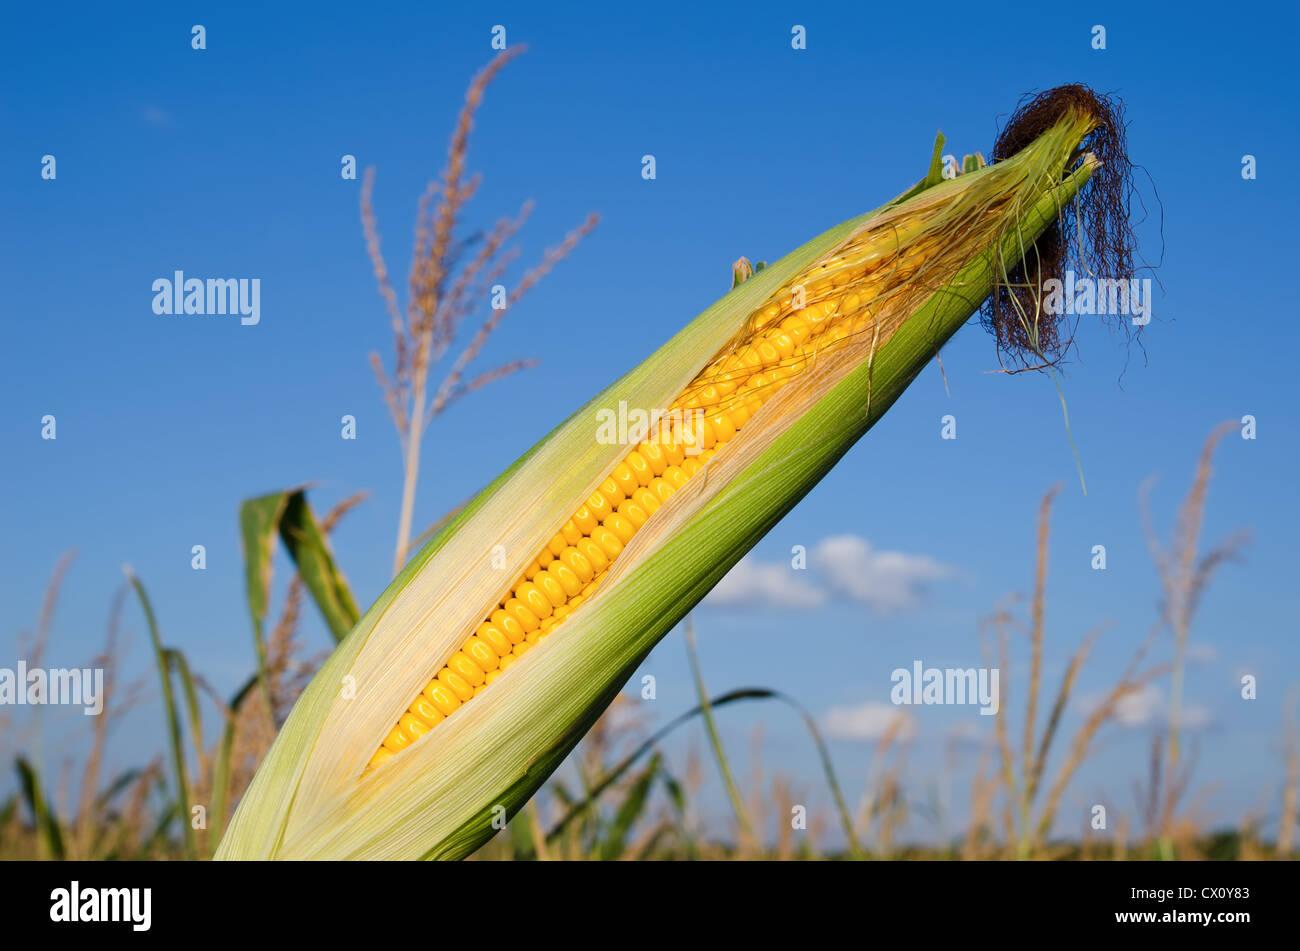 fresh raw corn on the cob with husk - Stock Image